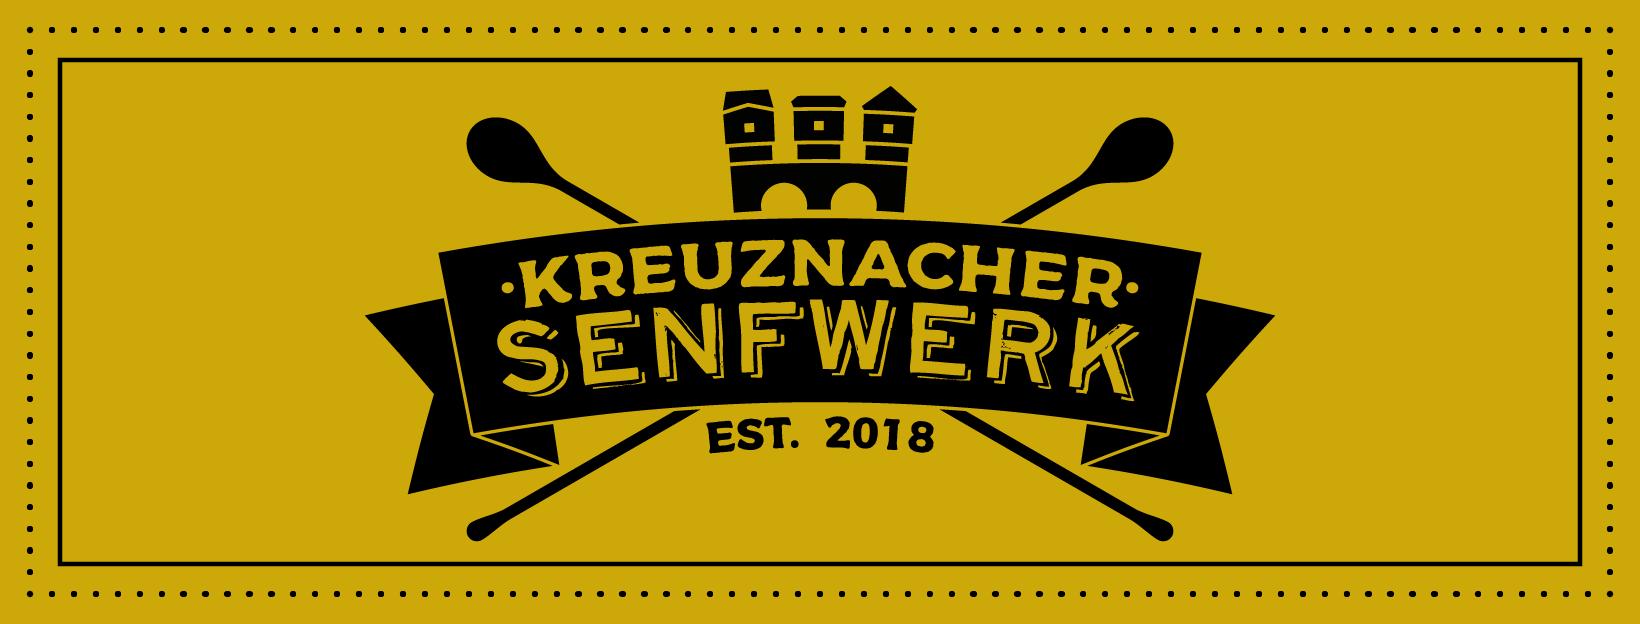 Kreuznacher Senfwerk